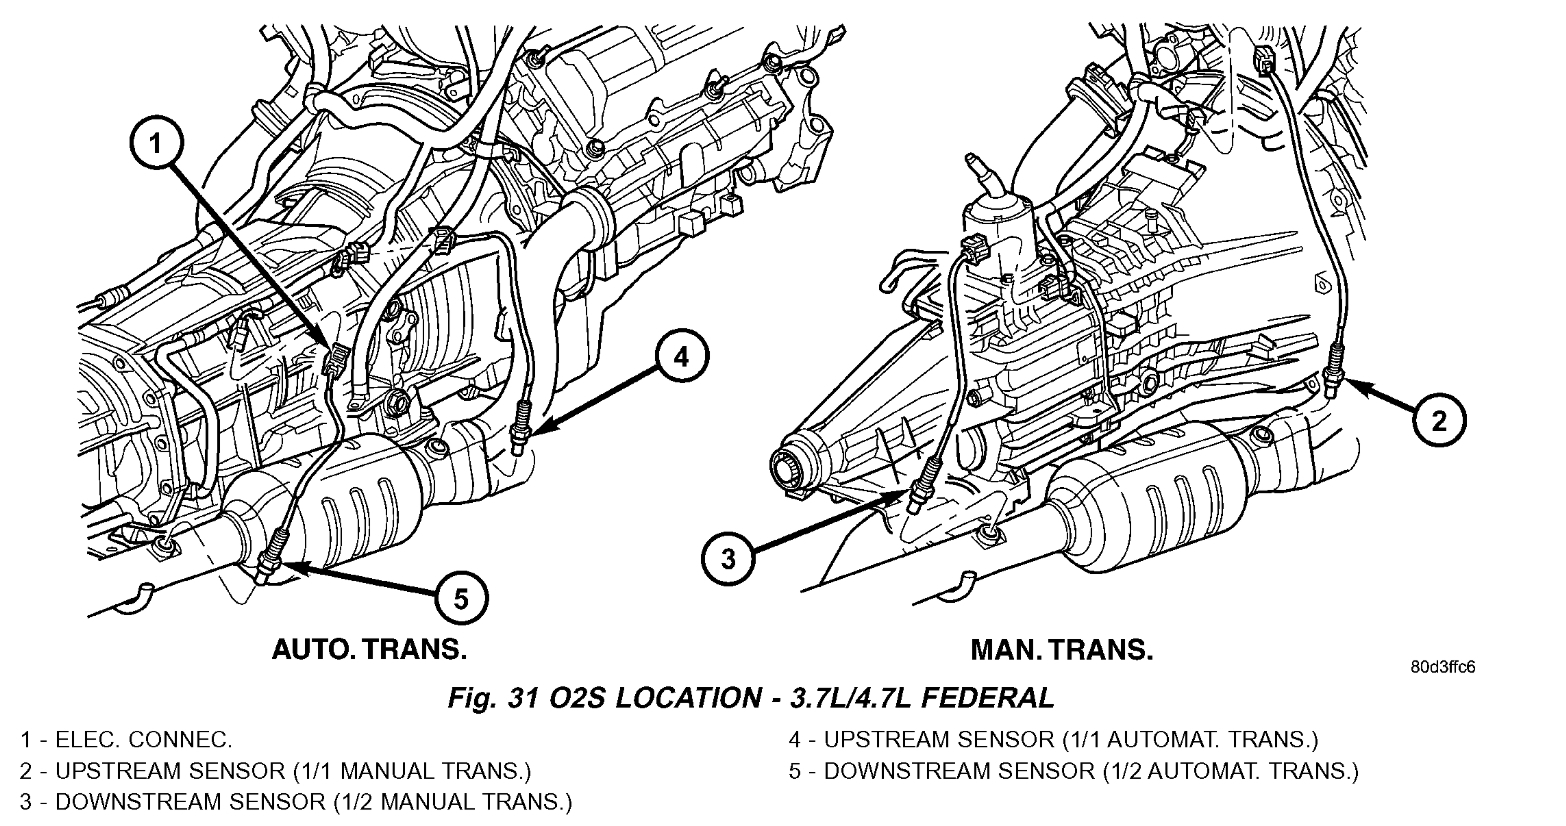 hight resolution of dodge 2 4 engine diagram 02 sensor diagram data schema dodge 2 4 engine diagram 02 sensor